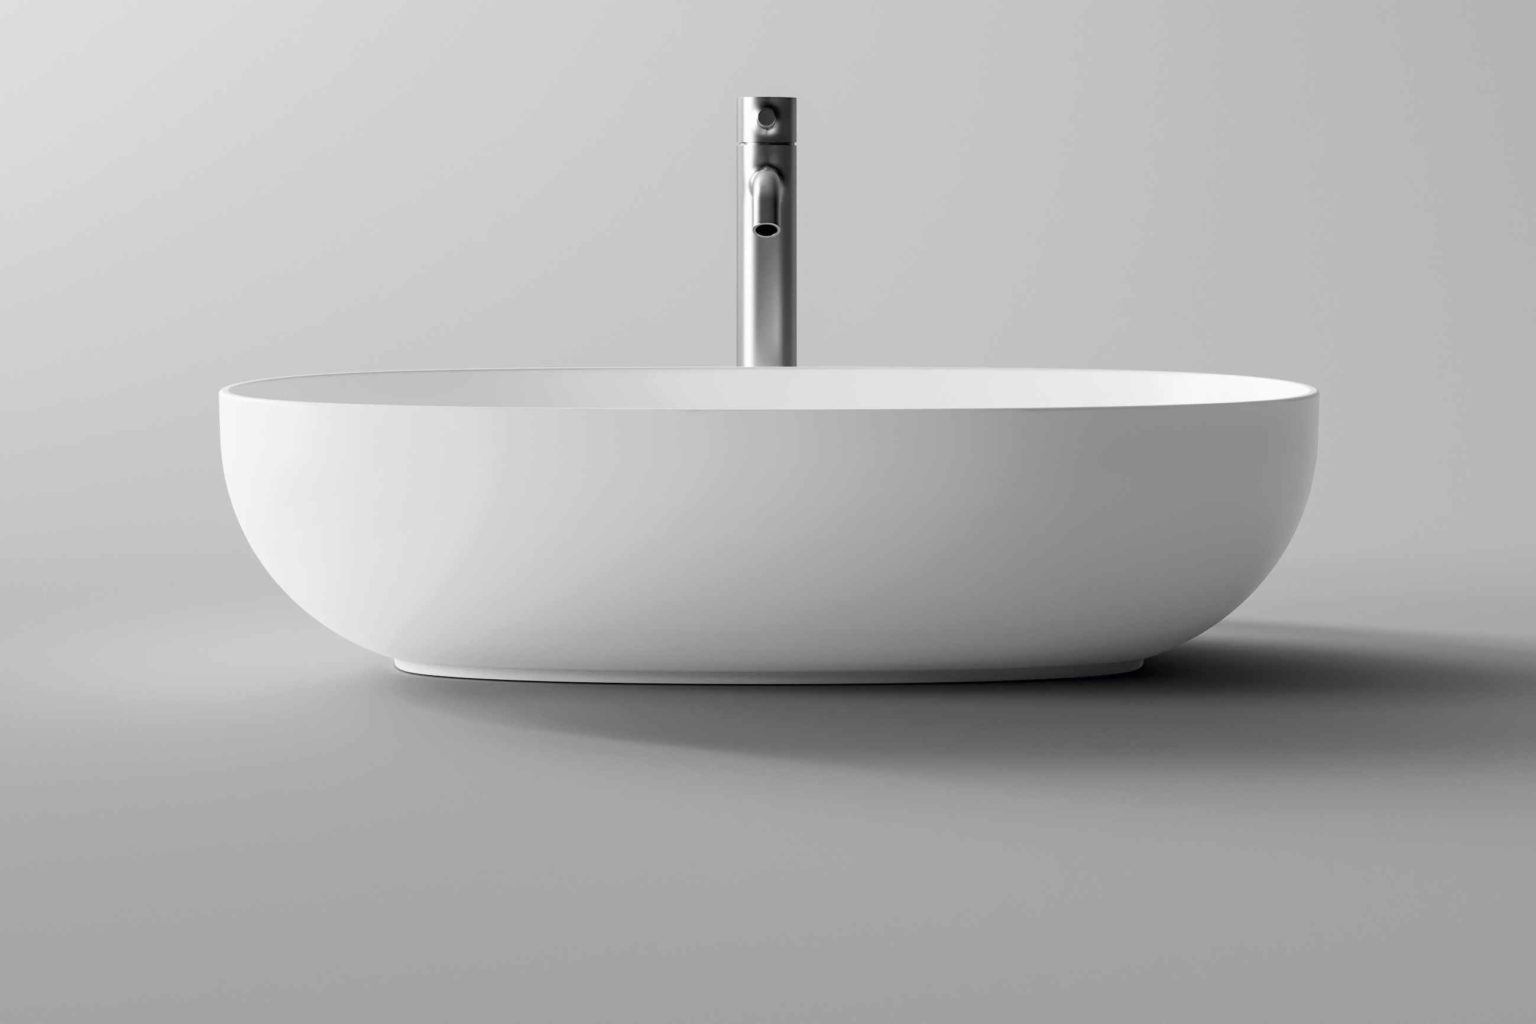 21014_Mastella-Lavello Soap v0 gen